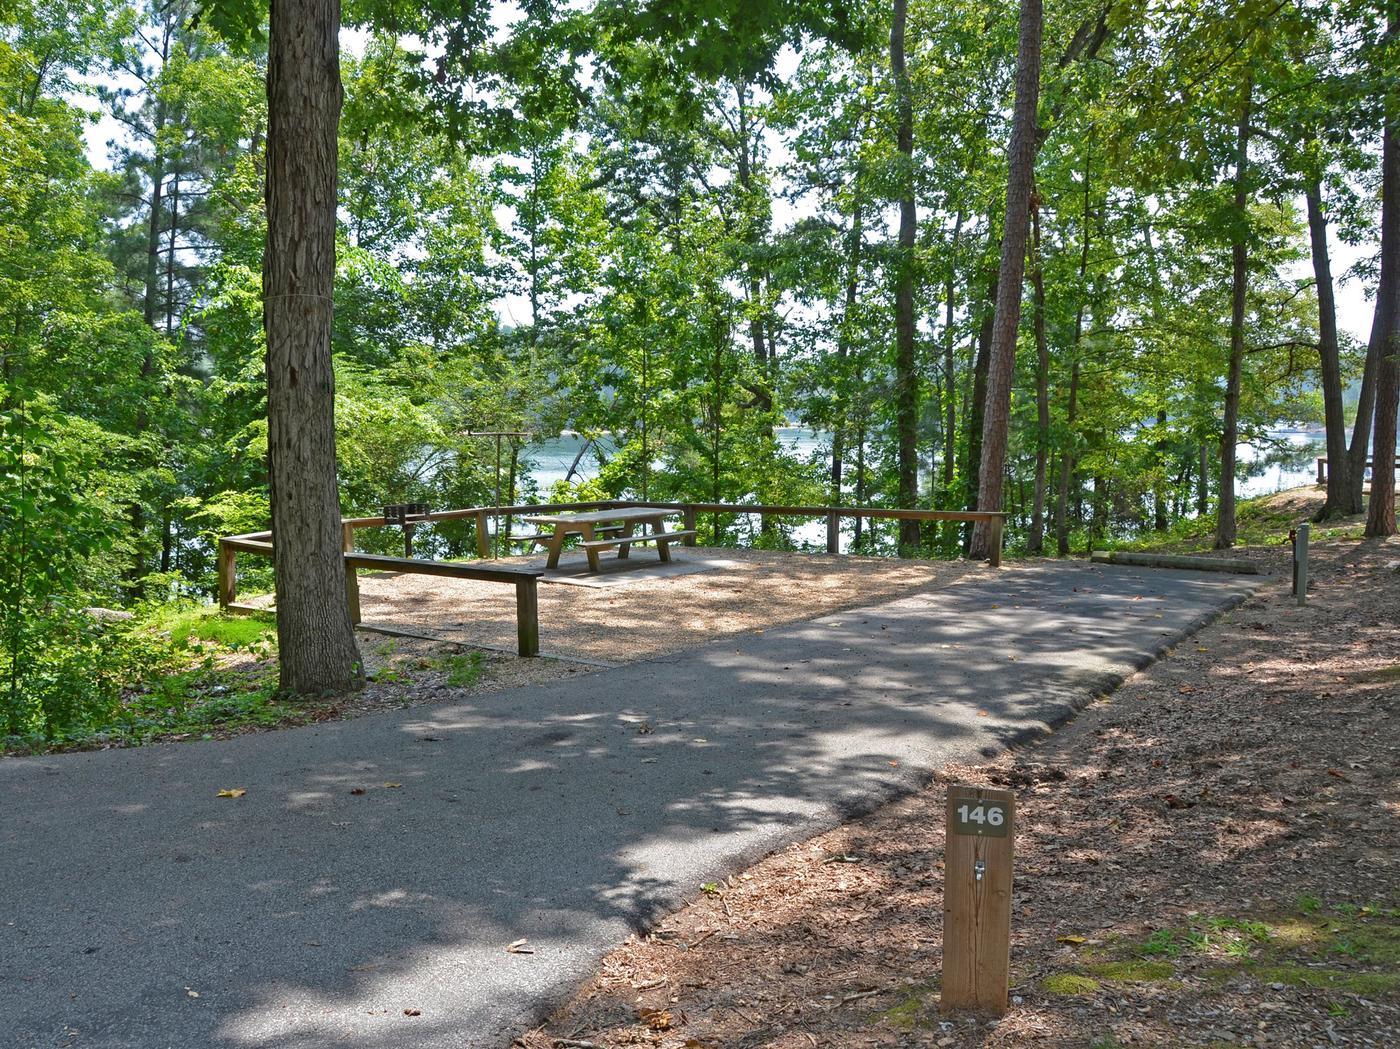 McKinney Campground Site 146..McKinney Campground Site 146